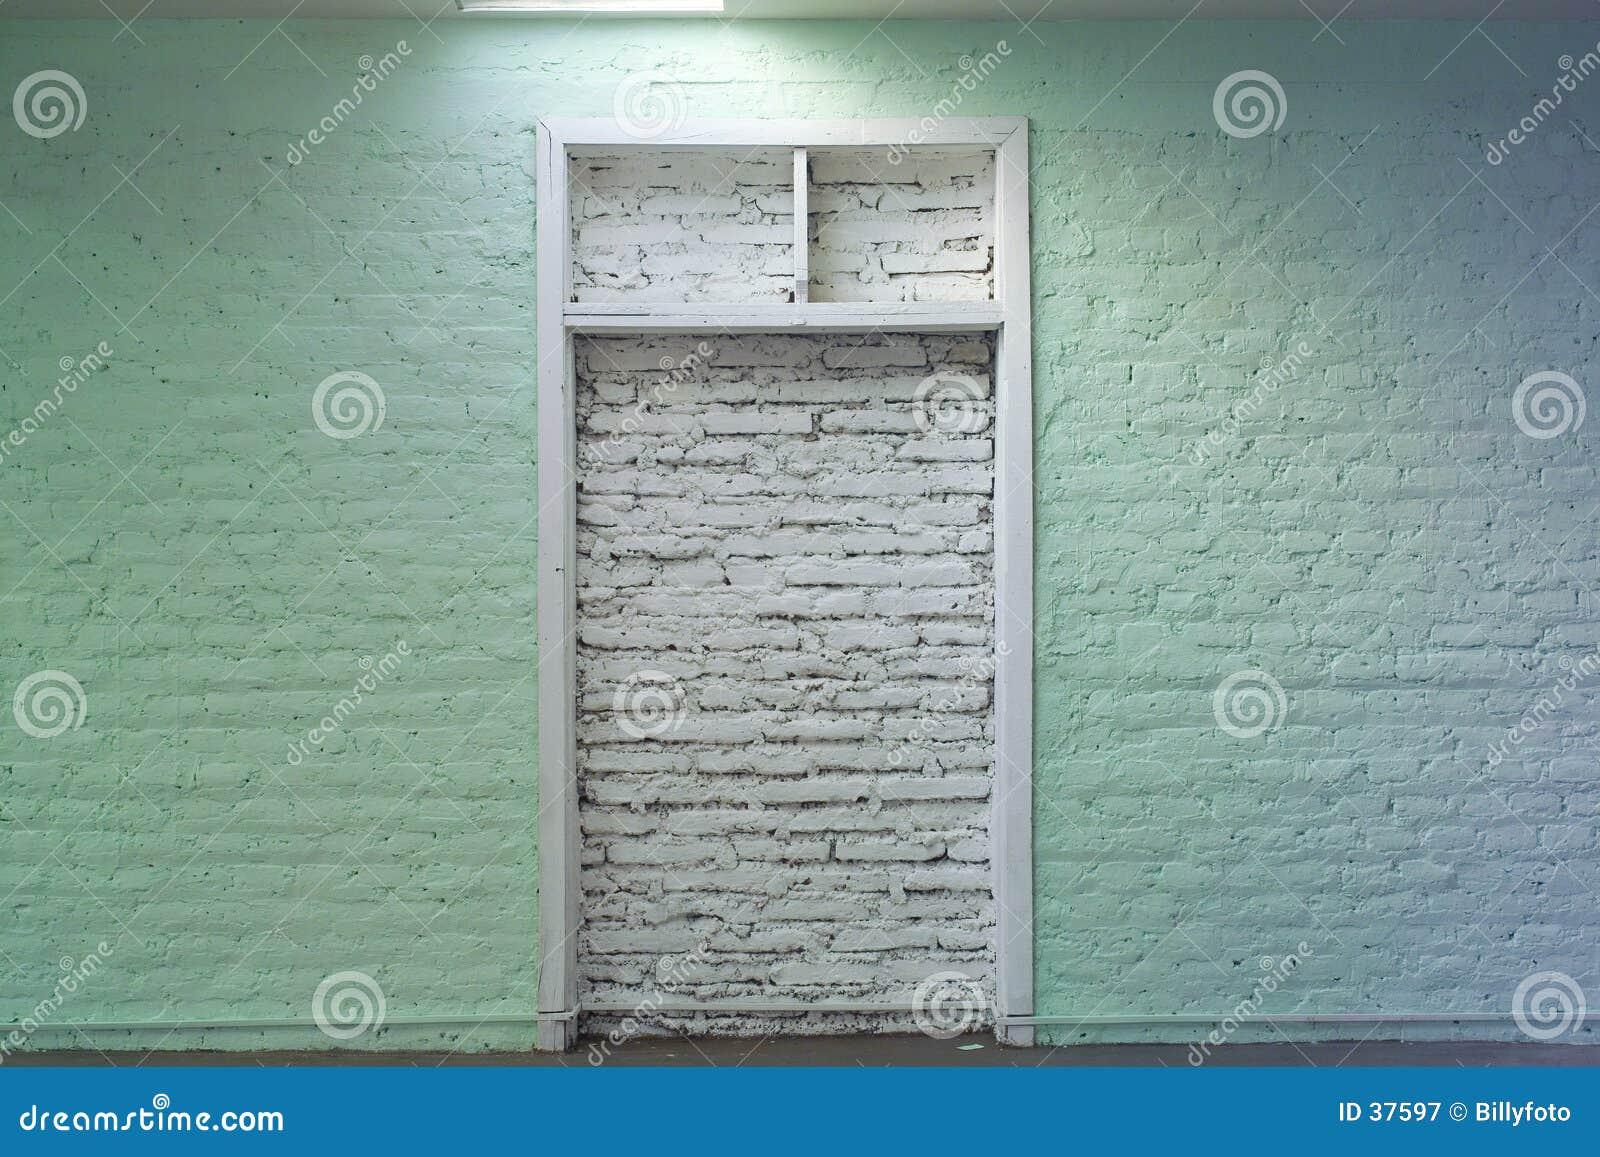 Download Pared verde imagen de archivo. Imagen de fuerza, paredes - 37597